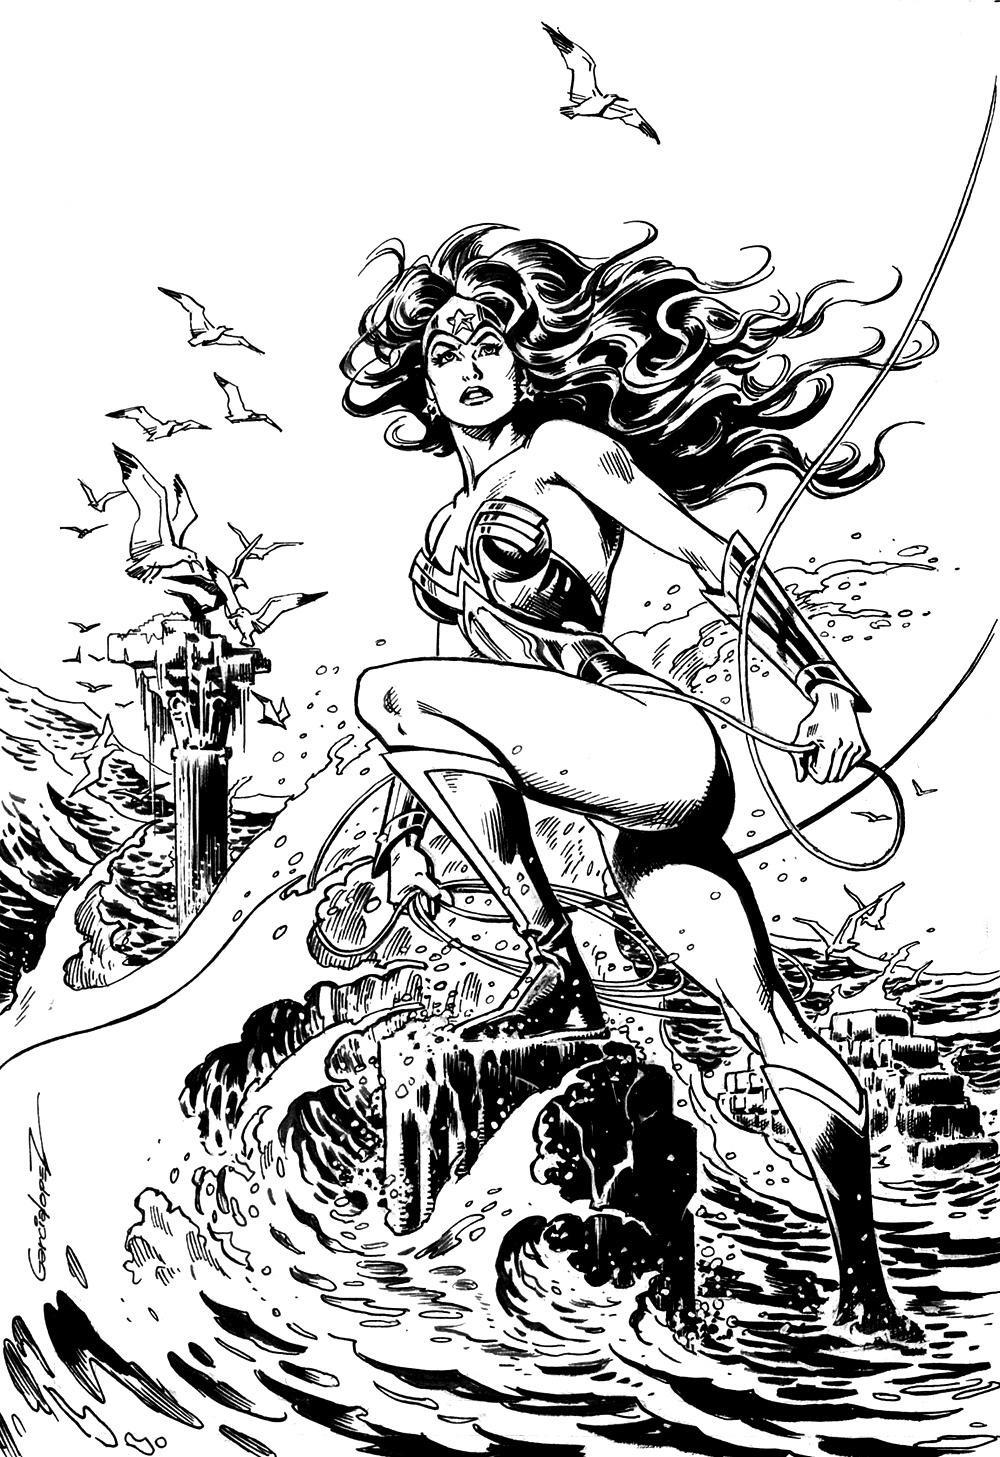 Jose Luis Garcia Lopez - Wonder Woman